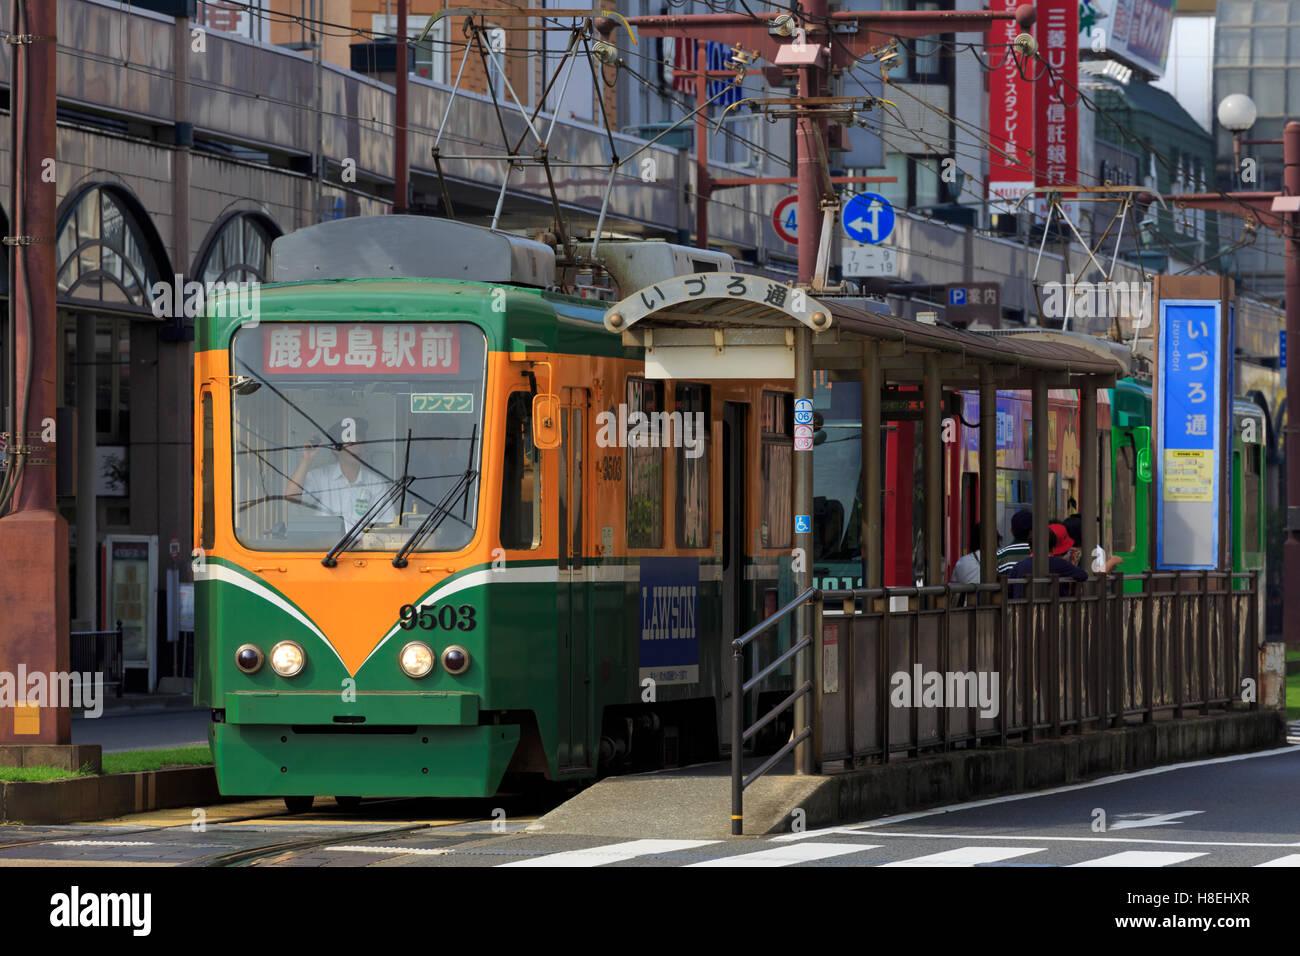 Tram, Izuro Street, Kagoshima City, Kyushu Island, Japan, Asia - Stock Image